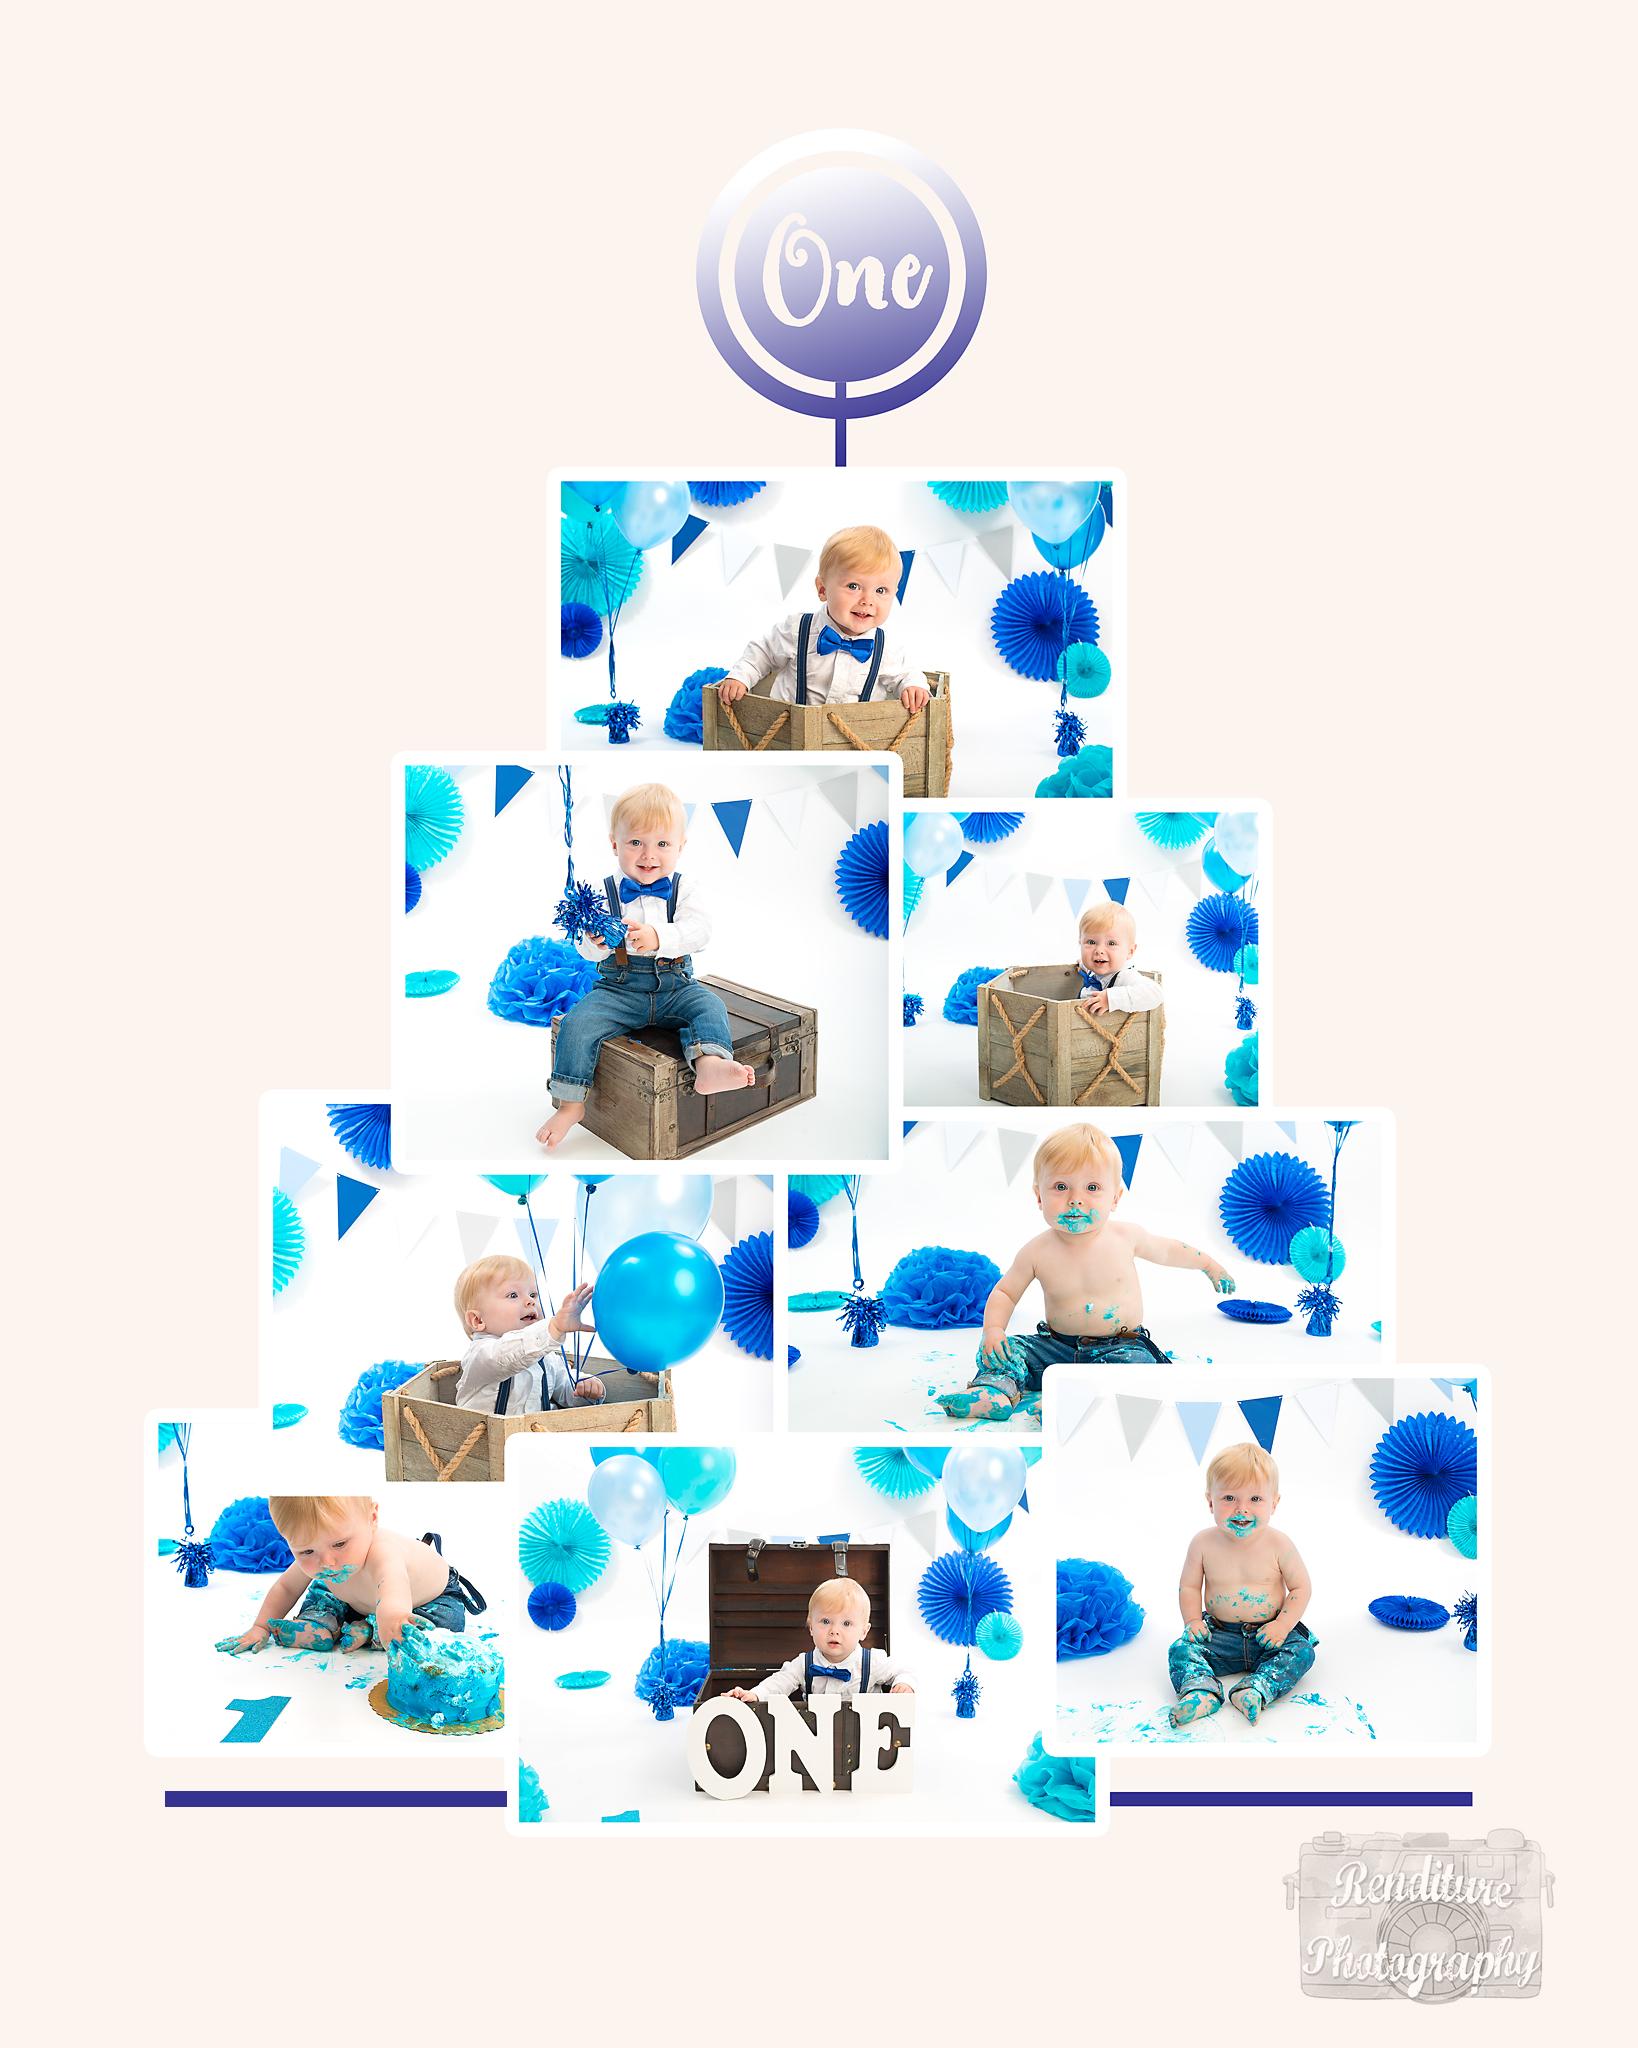 Saskatoon-Newborn-Family-Renditure-Baby-Photography-Photographer-Maternity-Pregnancy-Saskatchewan-408-FBR.jpg